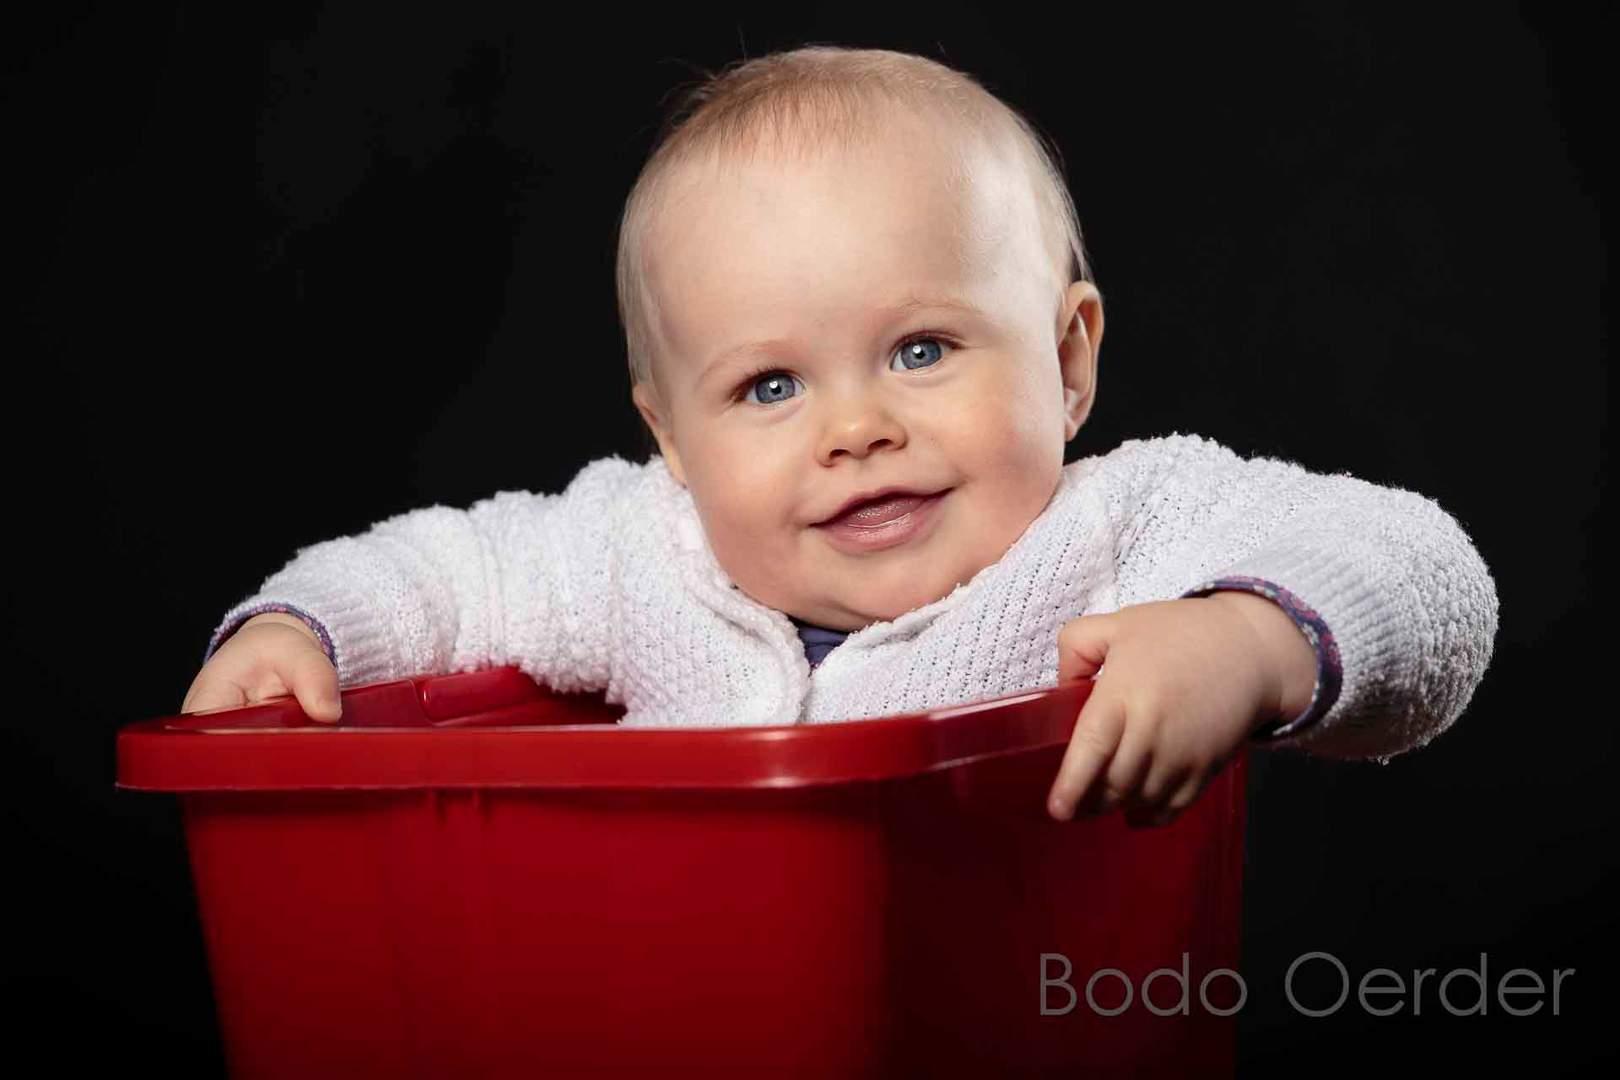 Baby im Studio in rotem Eimer